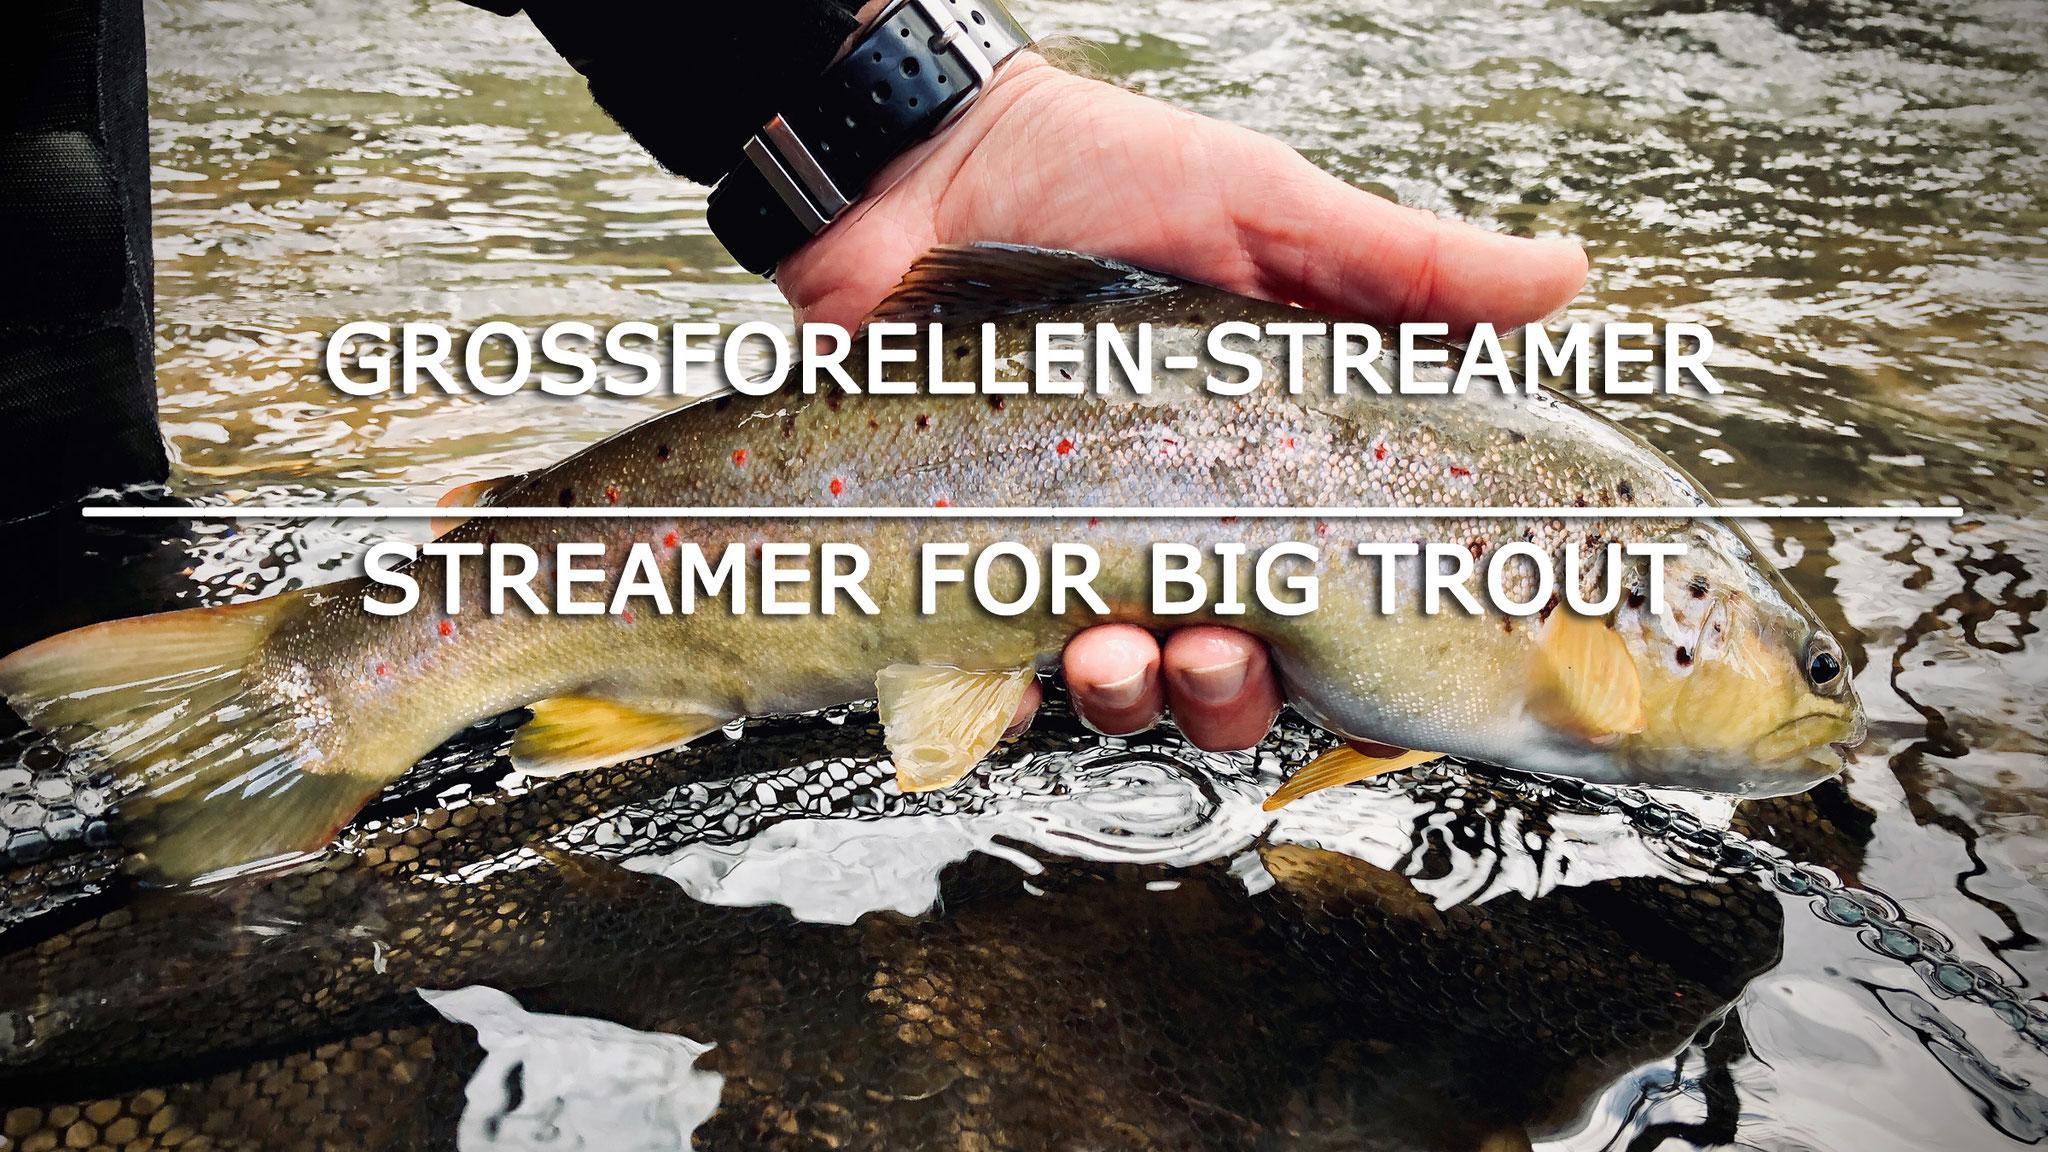 Grossforellen-Streamer / Fliegenfischerschule-Hessen